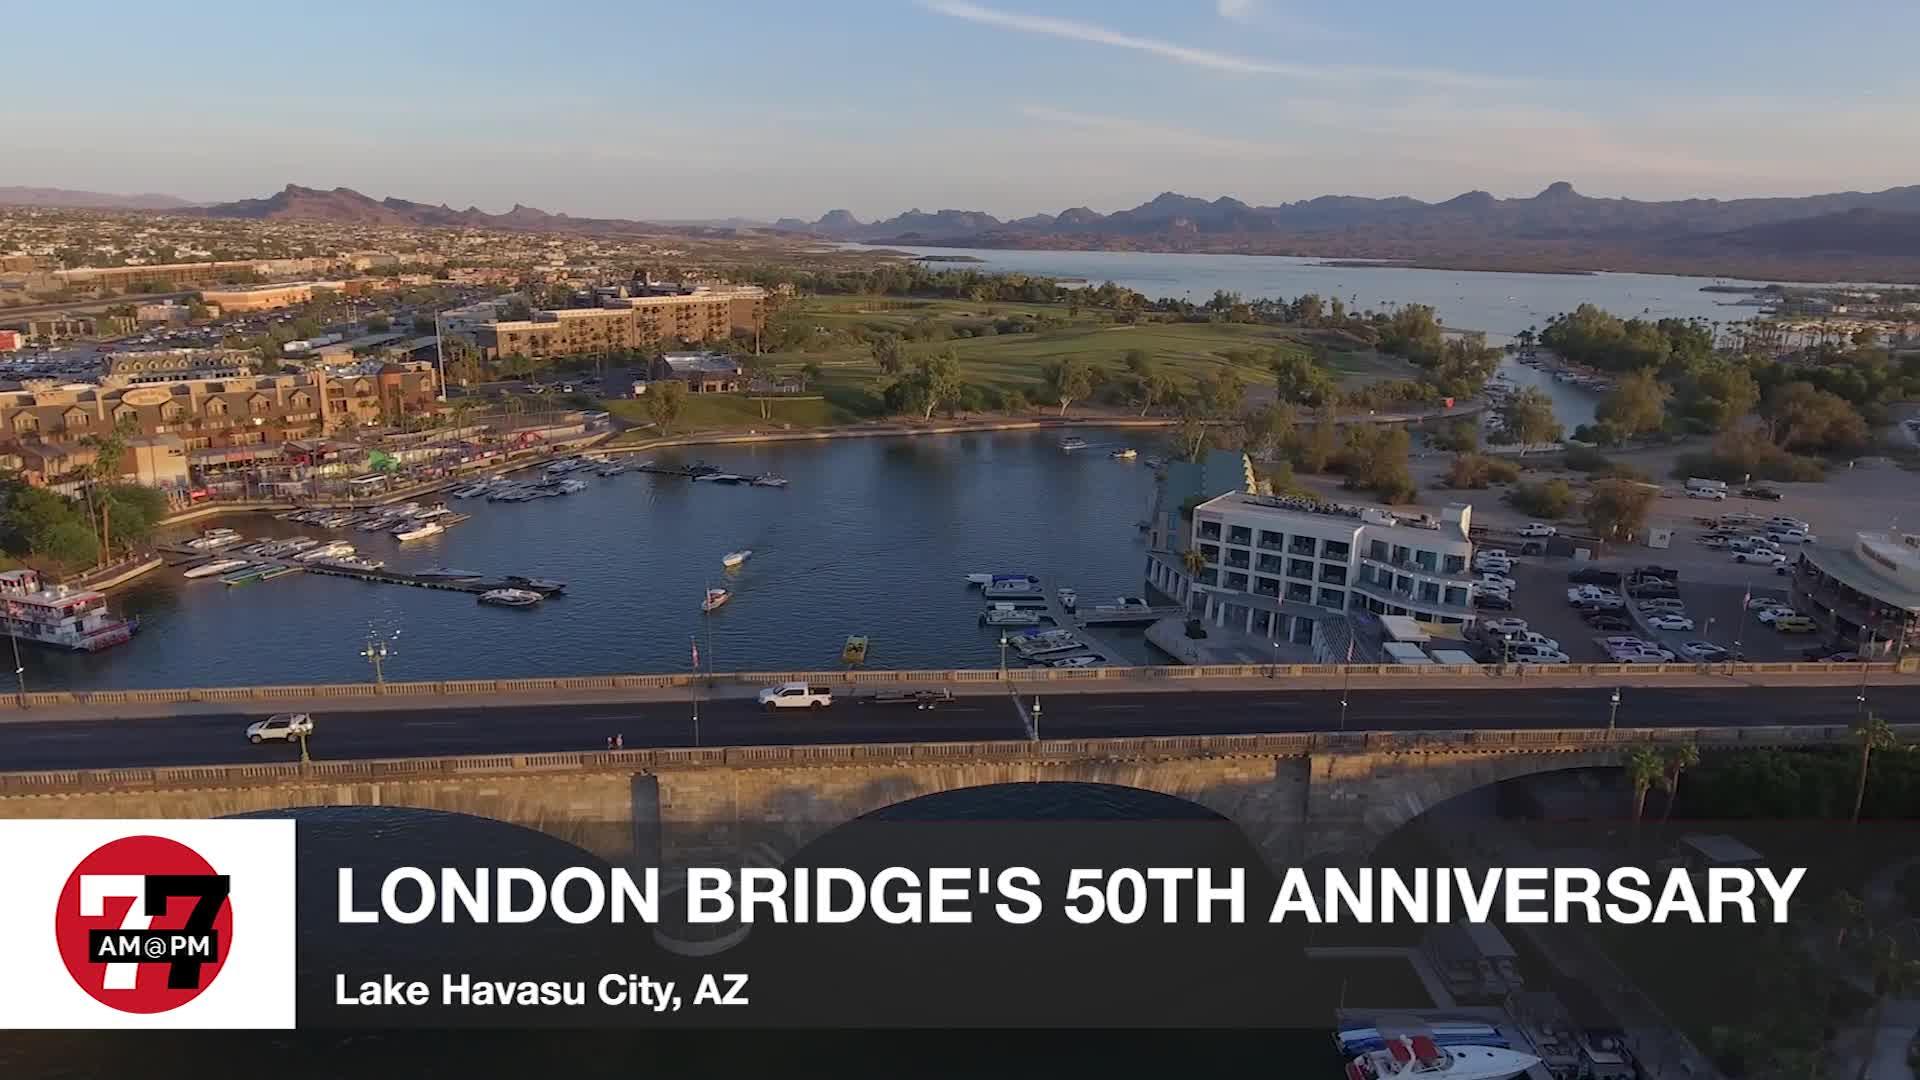 7@7PM London Bridge's 50th Anniversary